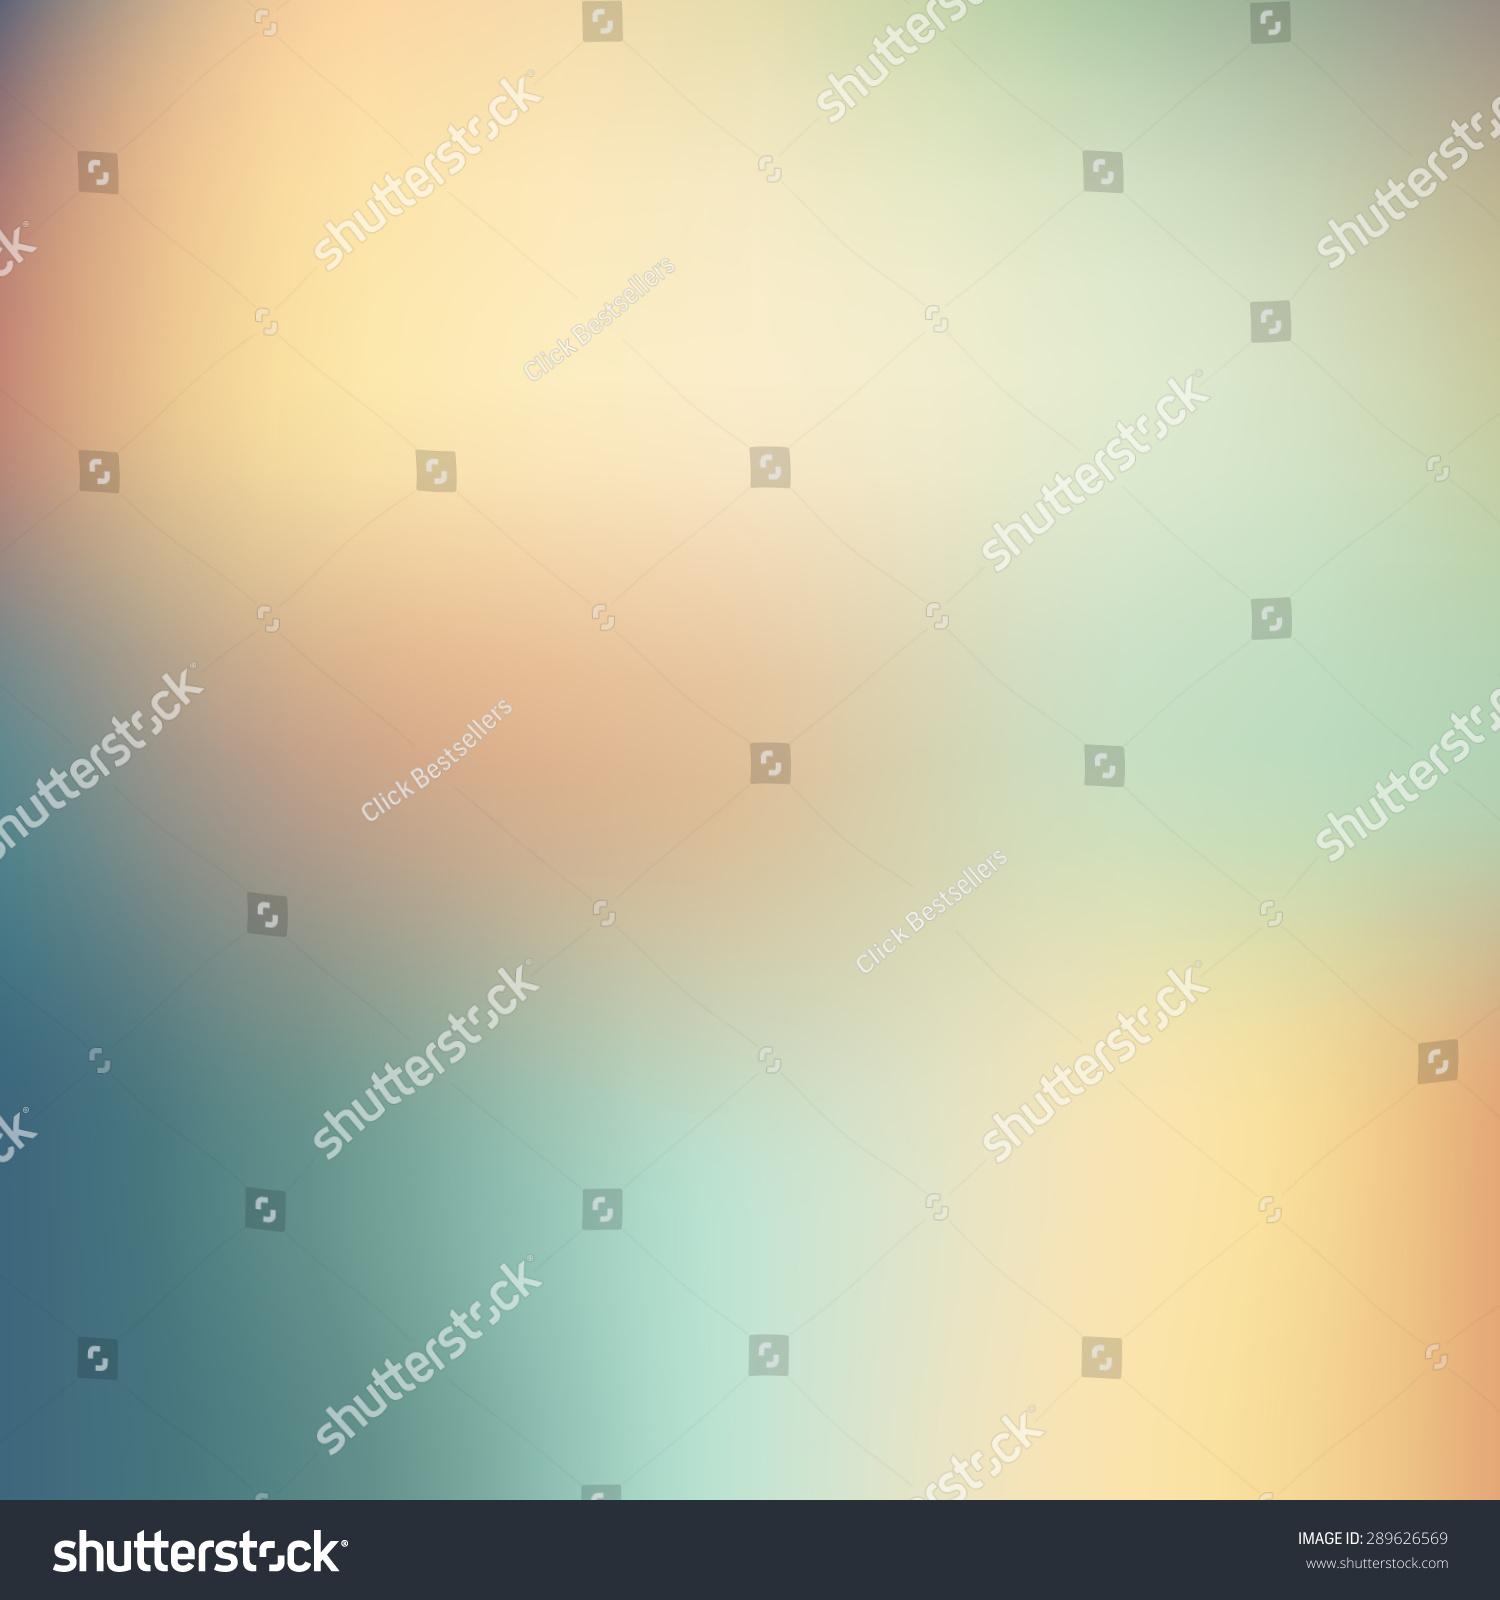 Vector Illustration Instagram: Vector Illustration Smooth Colorful Background Eps 10